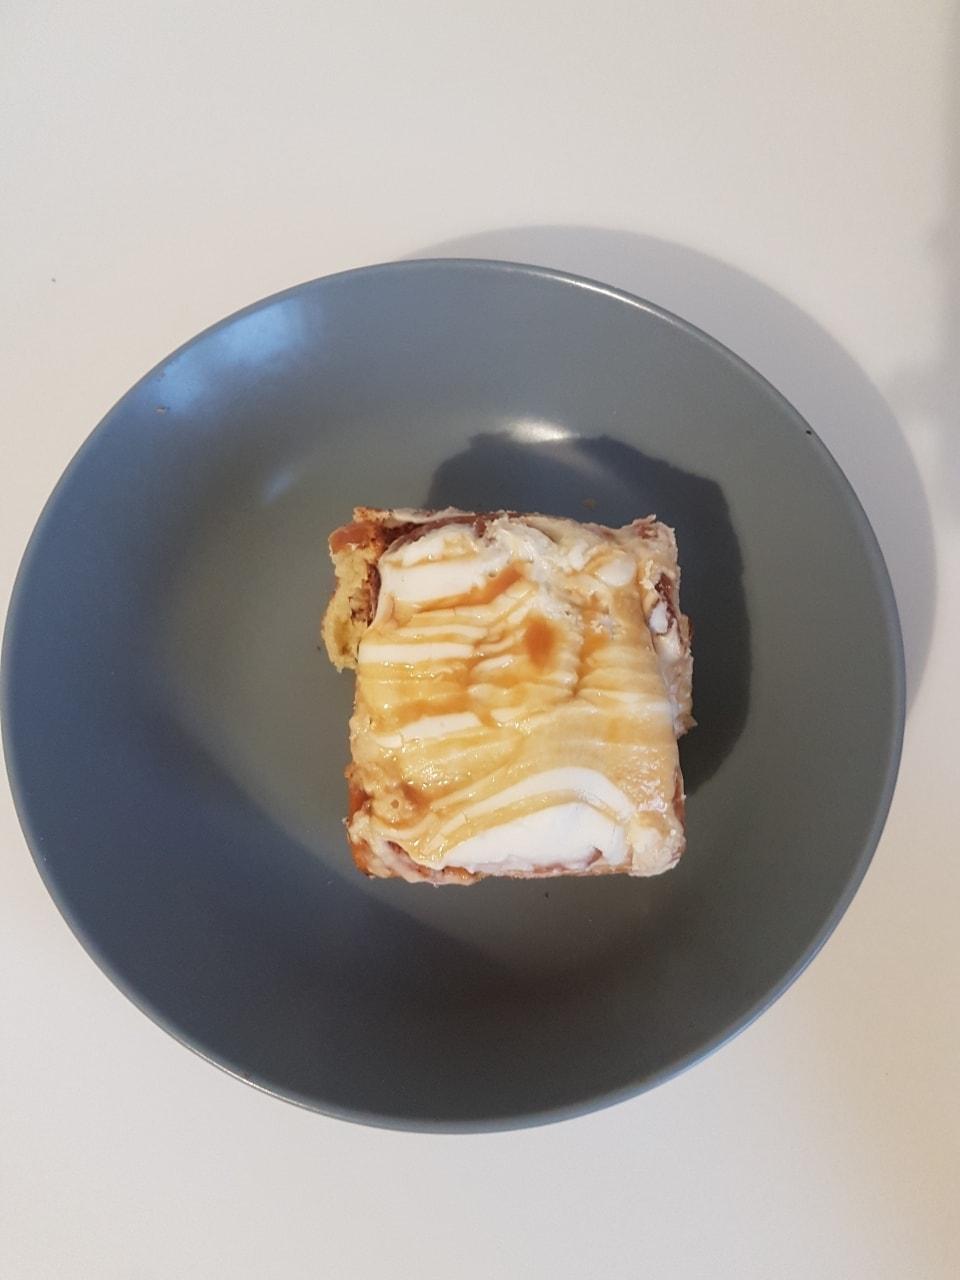 American style cinnamon bun